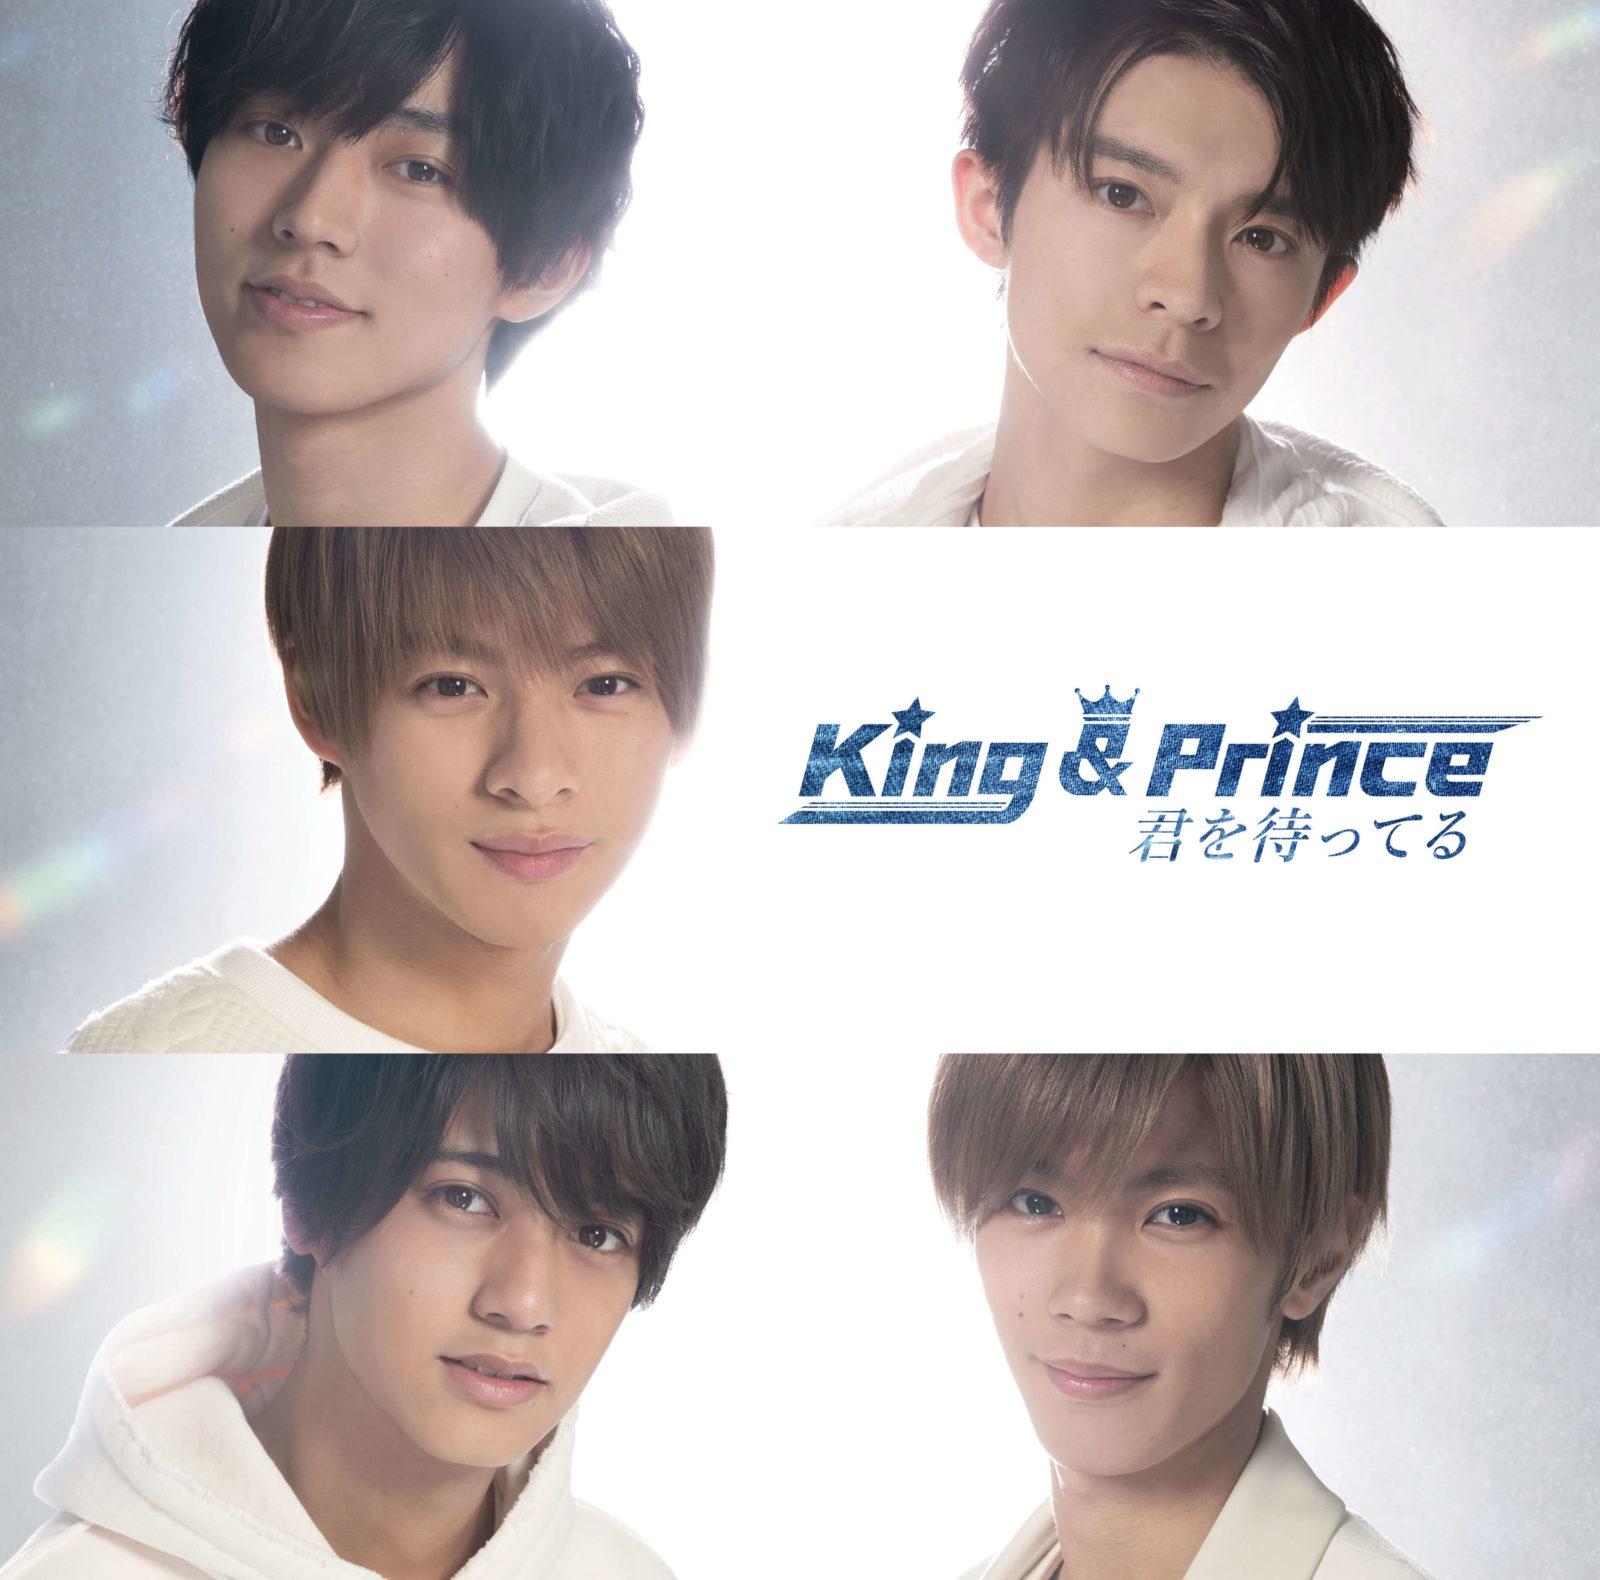 King & Prince、3rdシングル「君を待ってる」CDジャケット写真を公開サムネイル画像